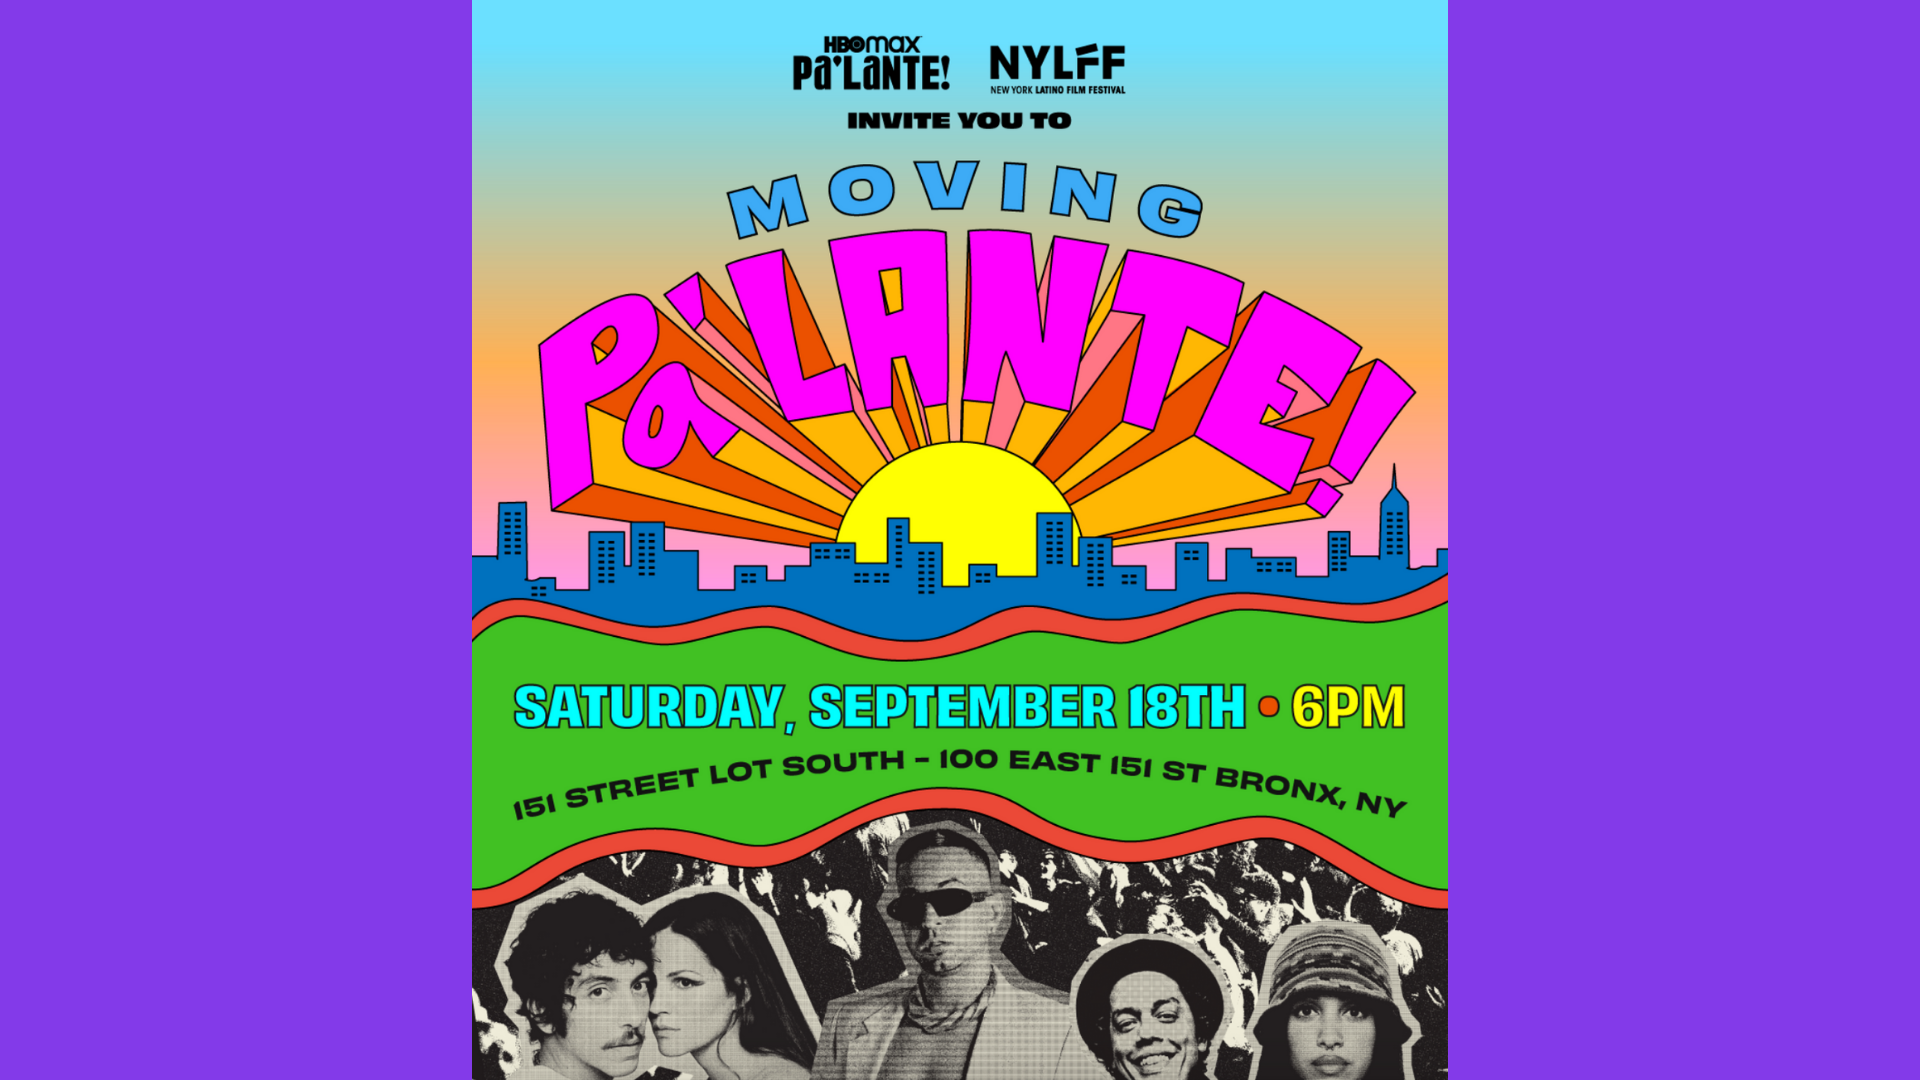 Moving Pa'lante! hBO Max  NYLFF